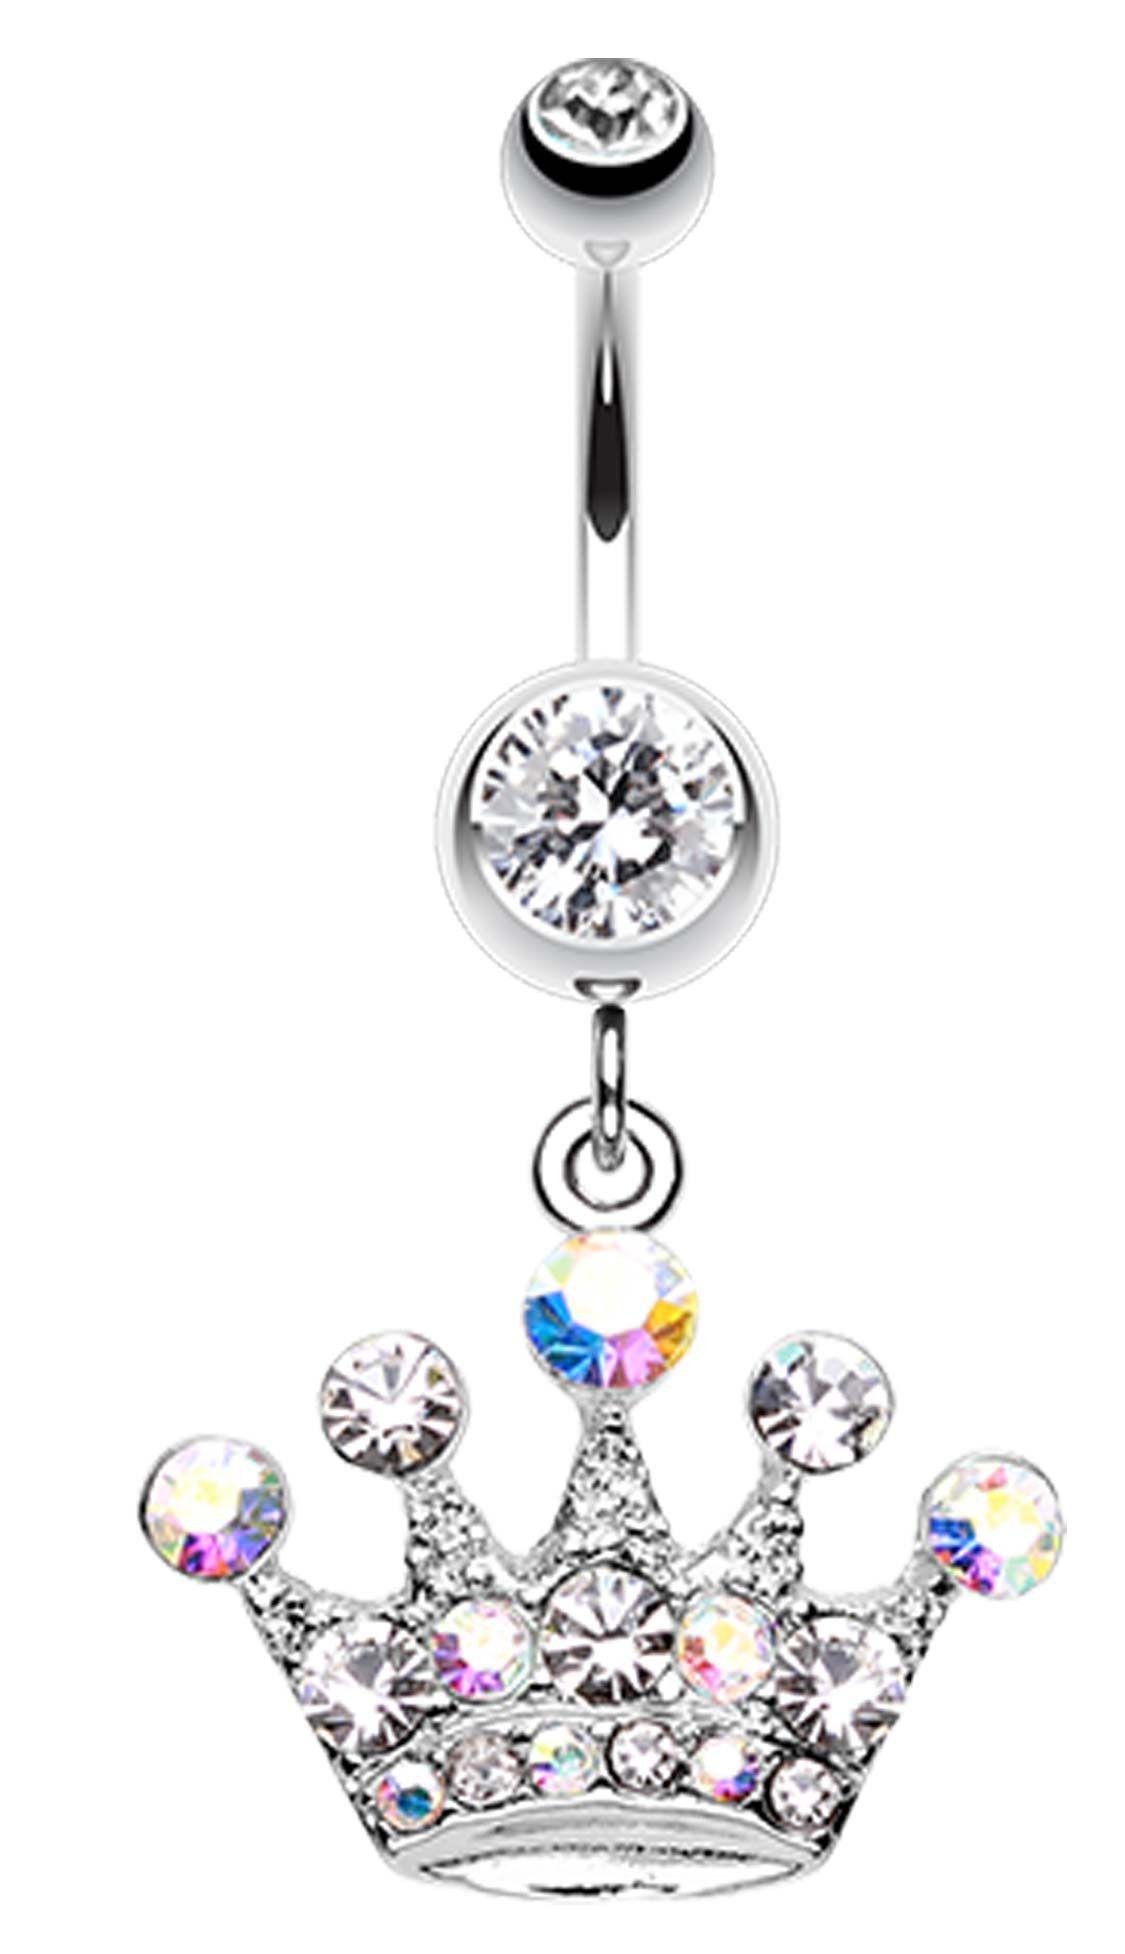 Navel piercing ideas  Crown Jewel MultiGlassGem Belly Button Ring  Crown jewels Belly